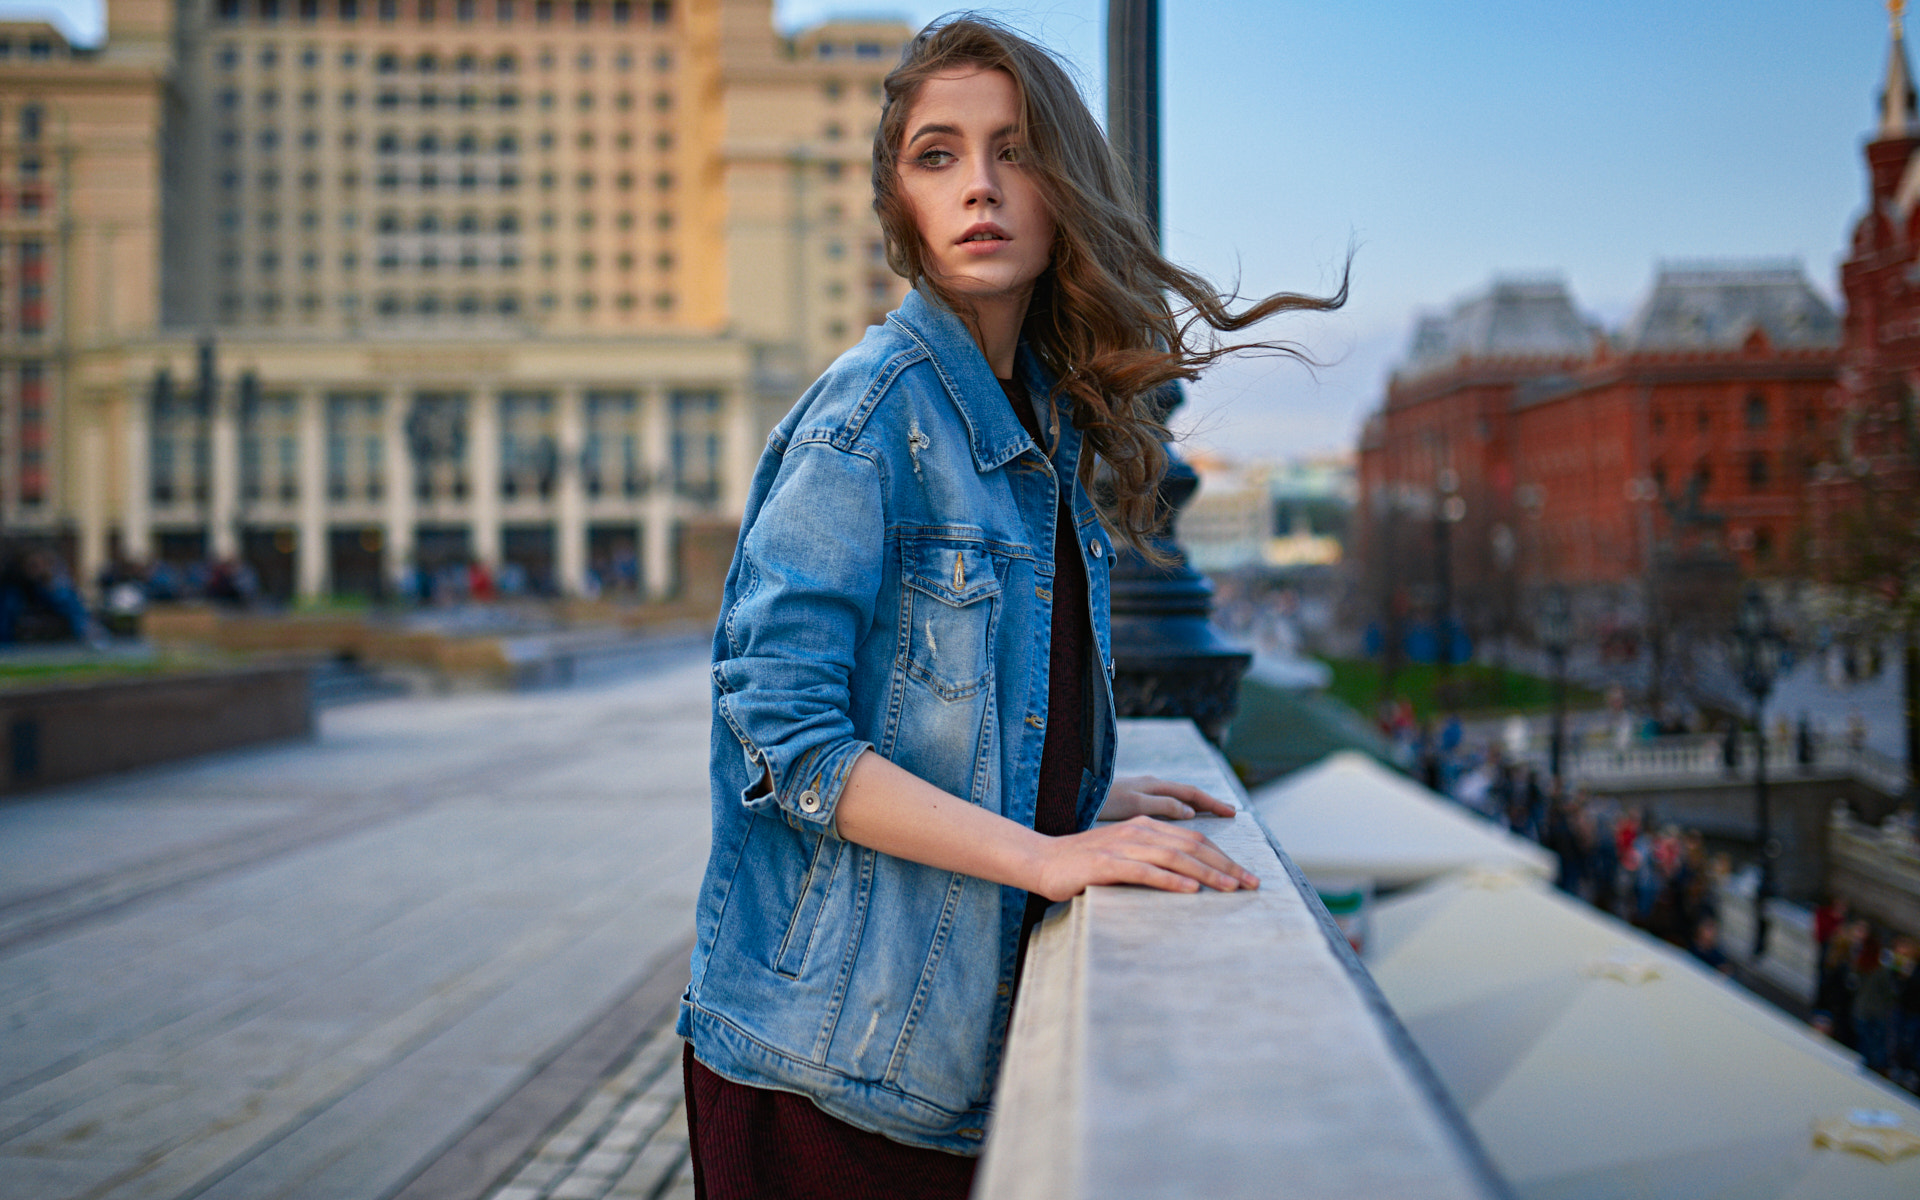 Sergey Fat Women Ksenia Kokoreva Brunette Long Hair Wavy Hair Wind Looking Away Denim Jacket Outdoor 1920x1200